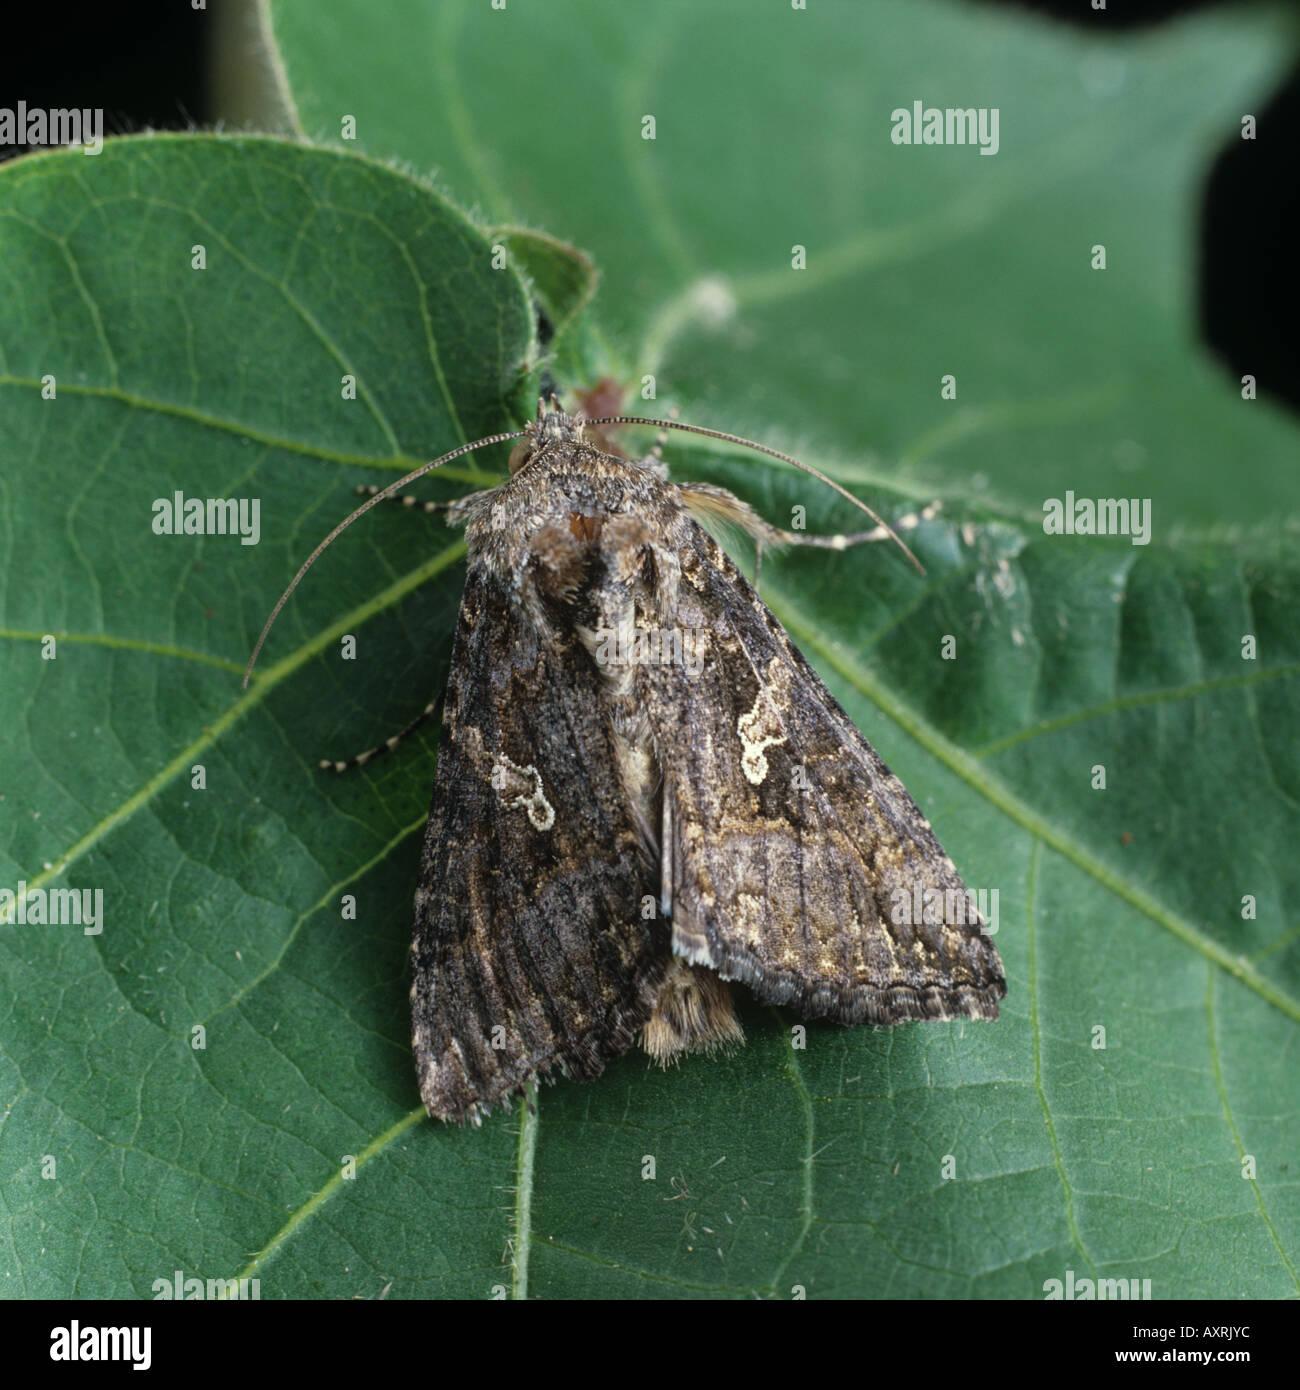 Cabbage looper Trichoplusia ni moth adult on a cotton leaf